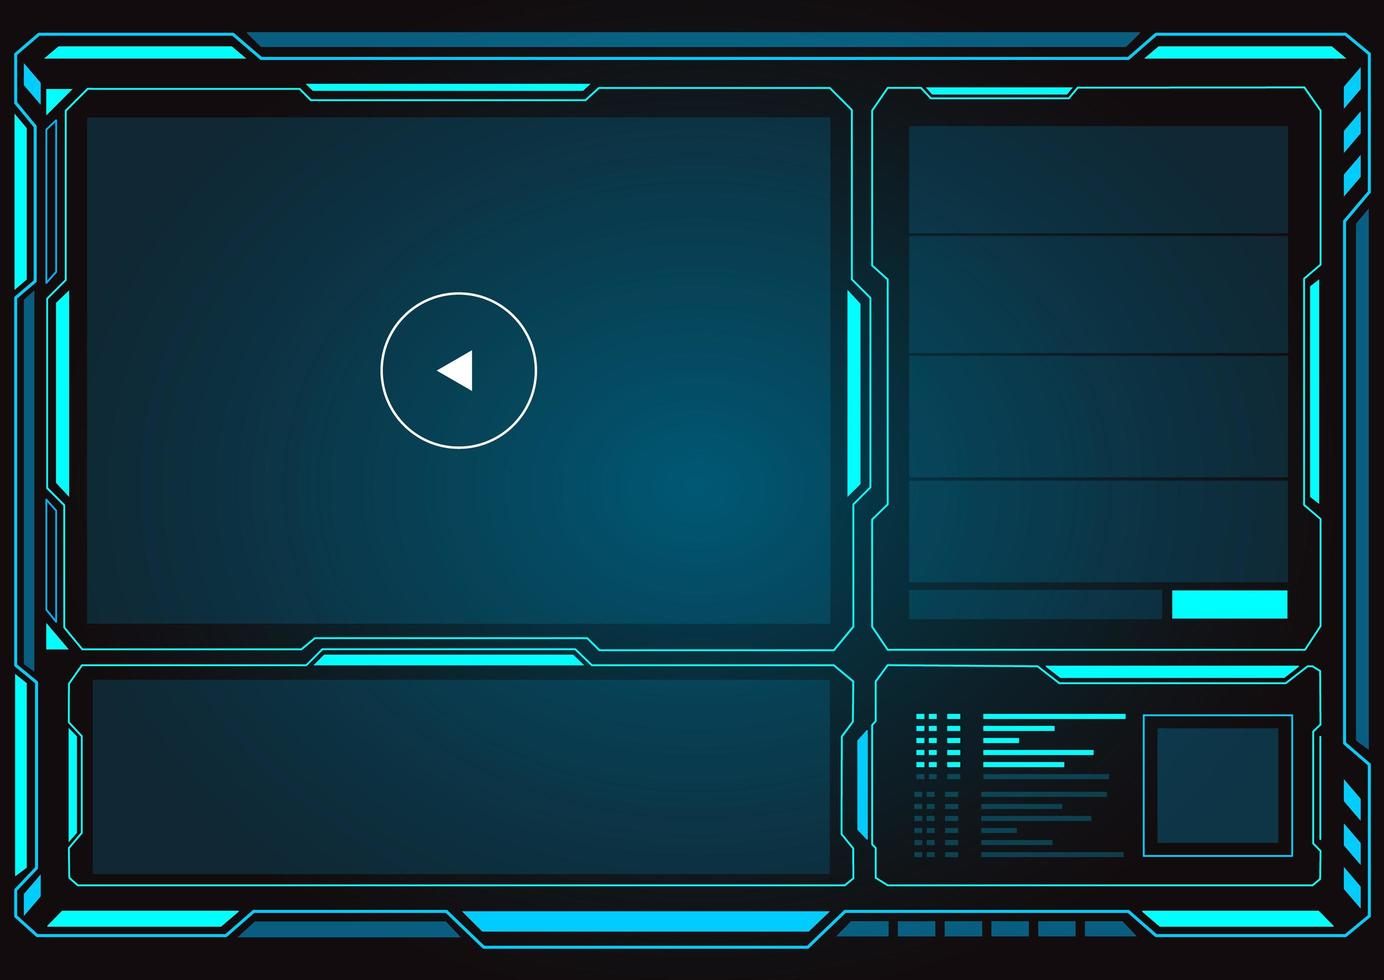 interface de interface com o player de vídeo vetor